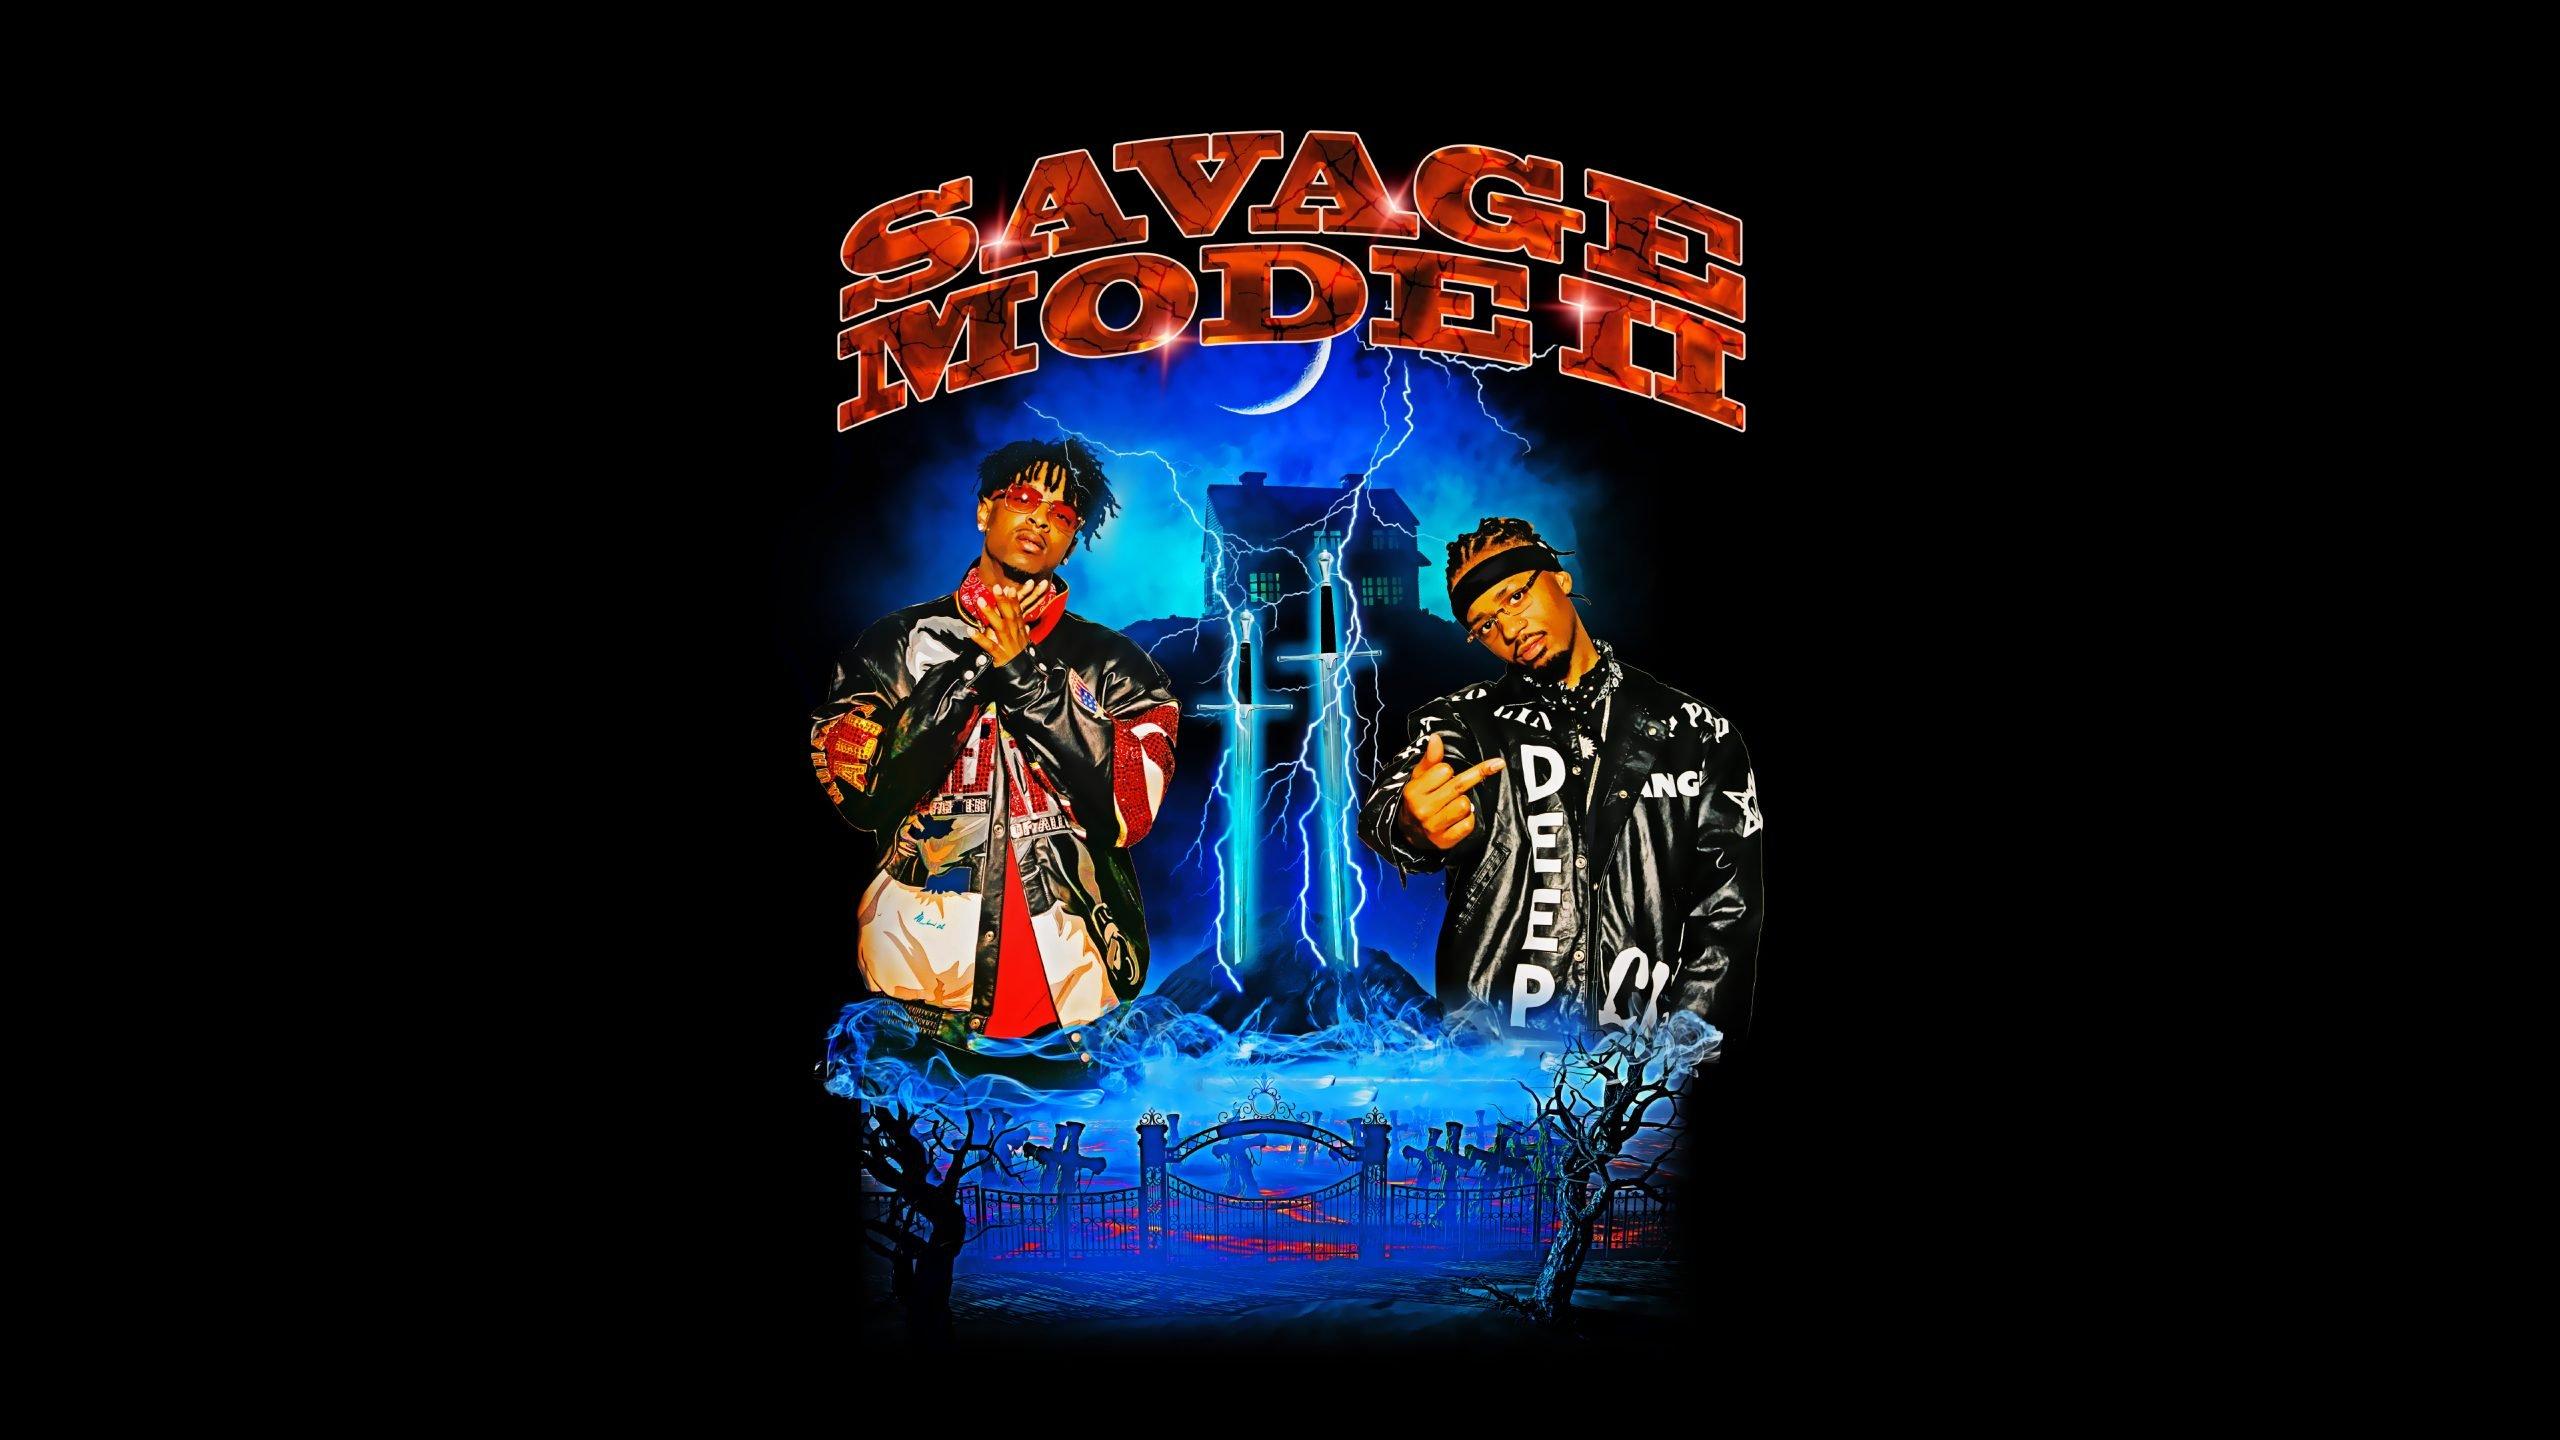 SAVAGE MODE II-merch-product 2 slider-01